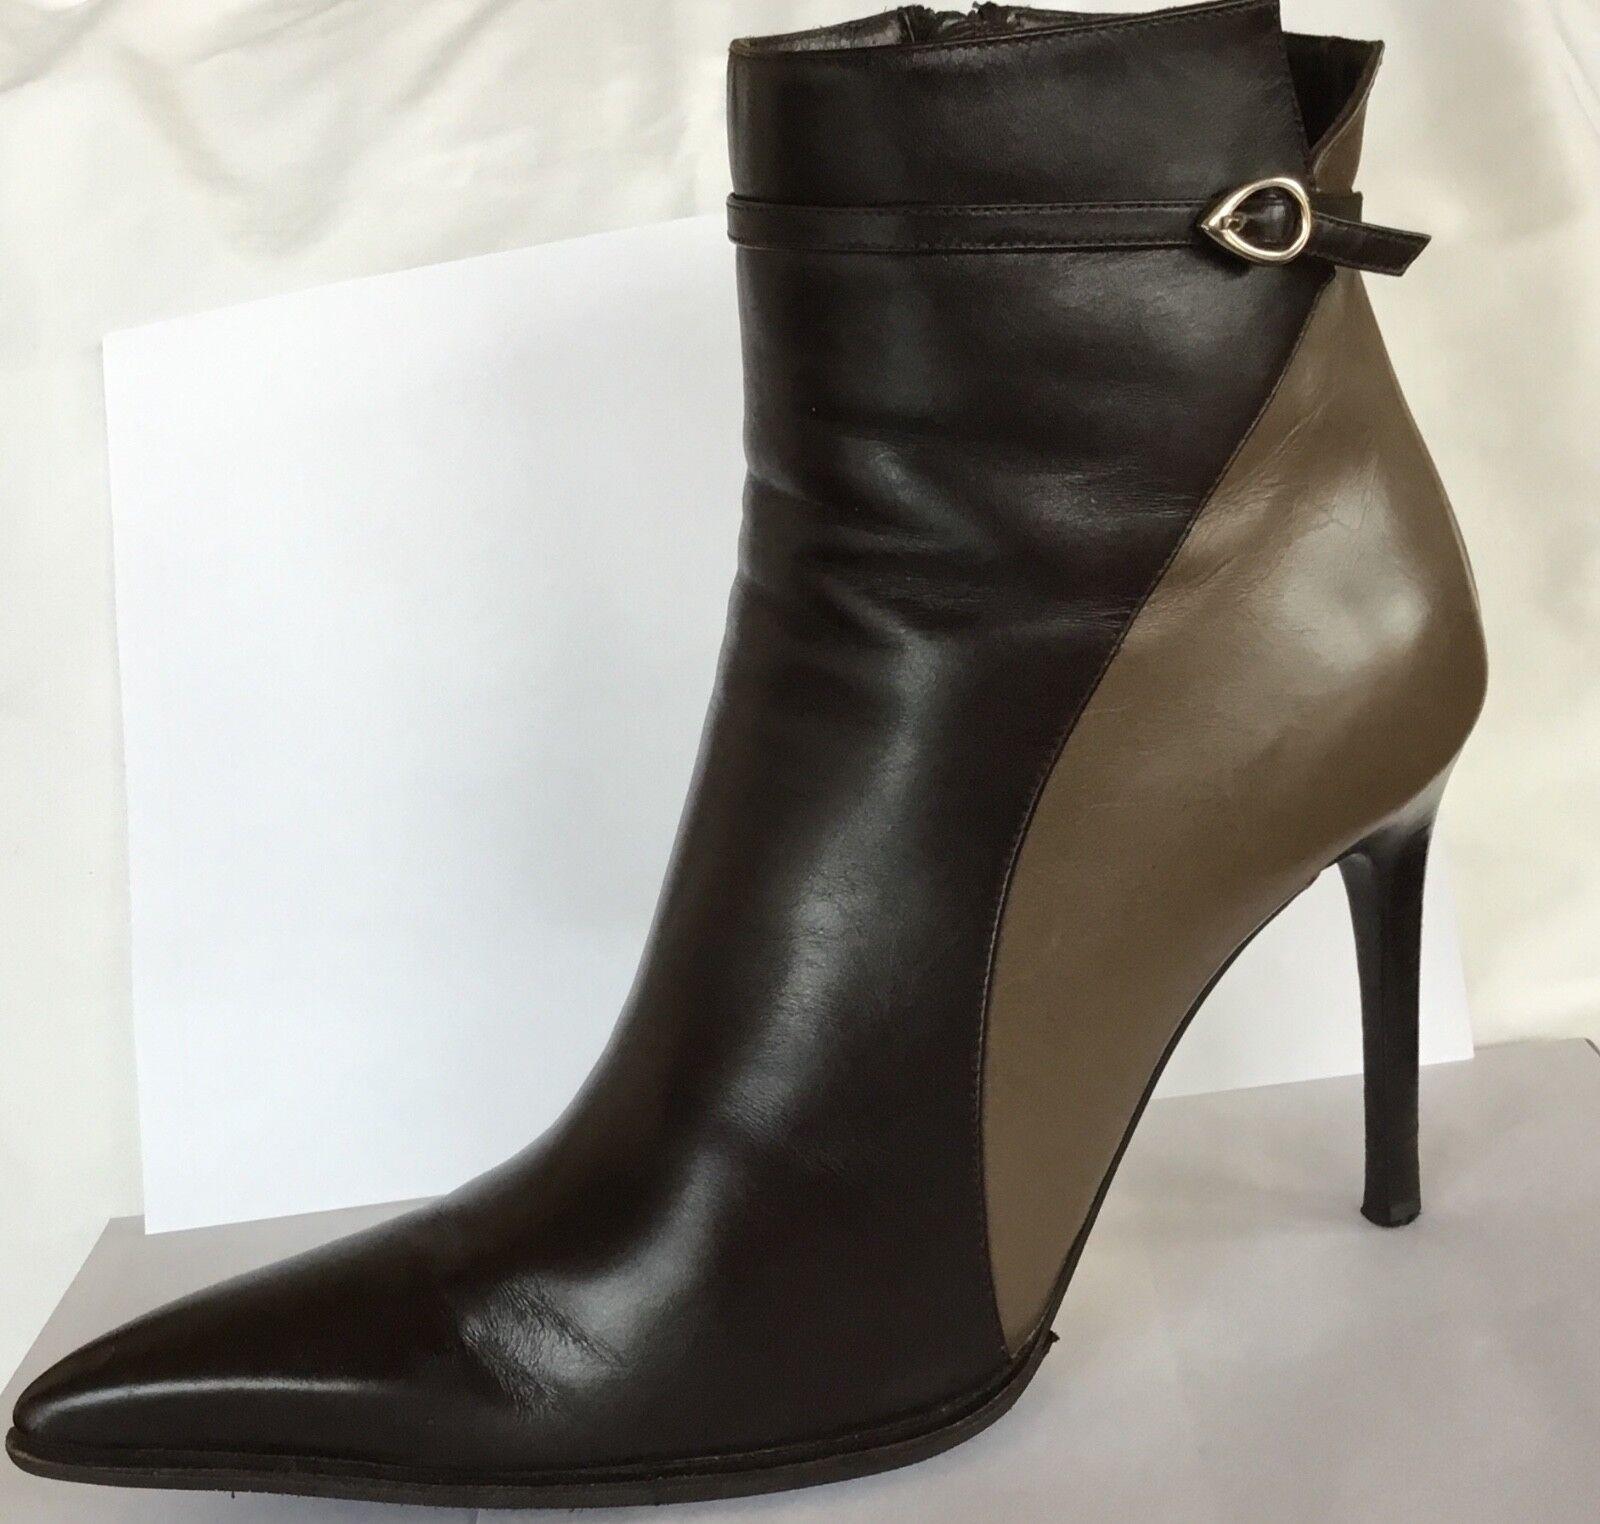 Goffroto Fantini Stiefel Leather braun   Mocca Short Stiefel SZ 39.5  9.5